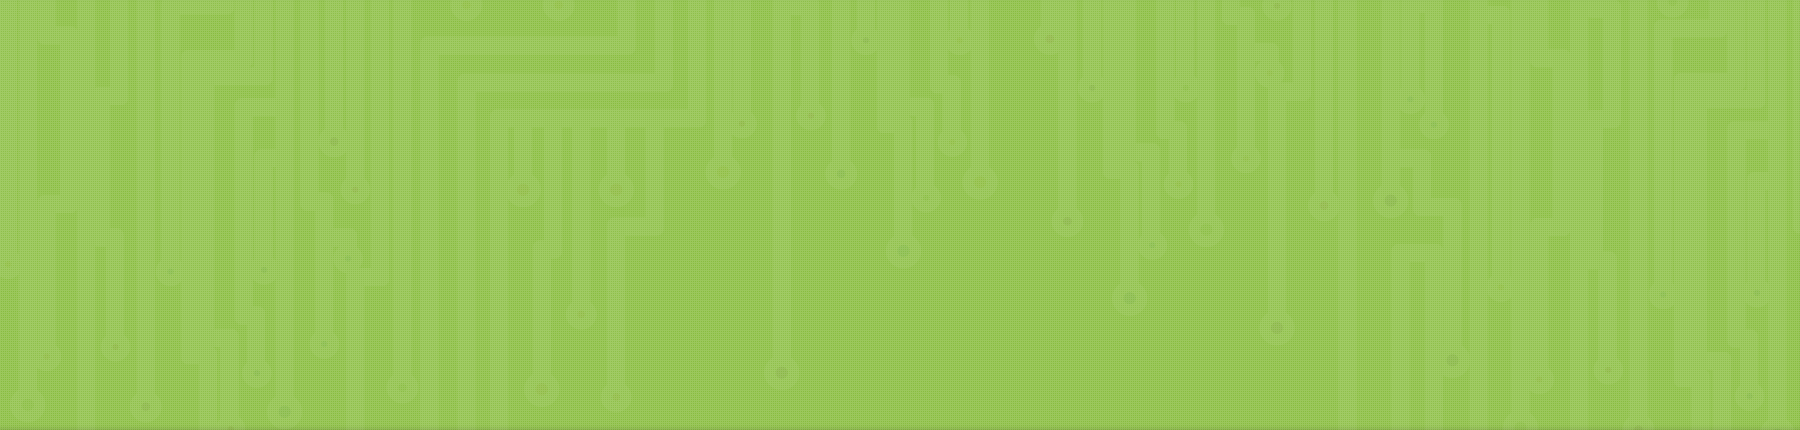 i7lab-green-background